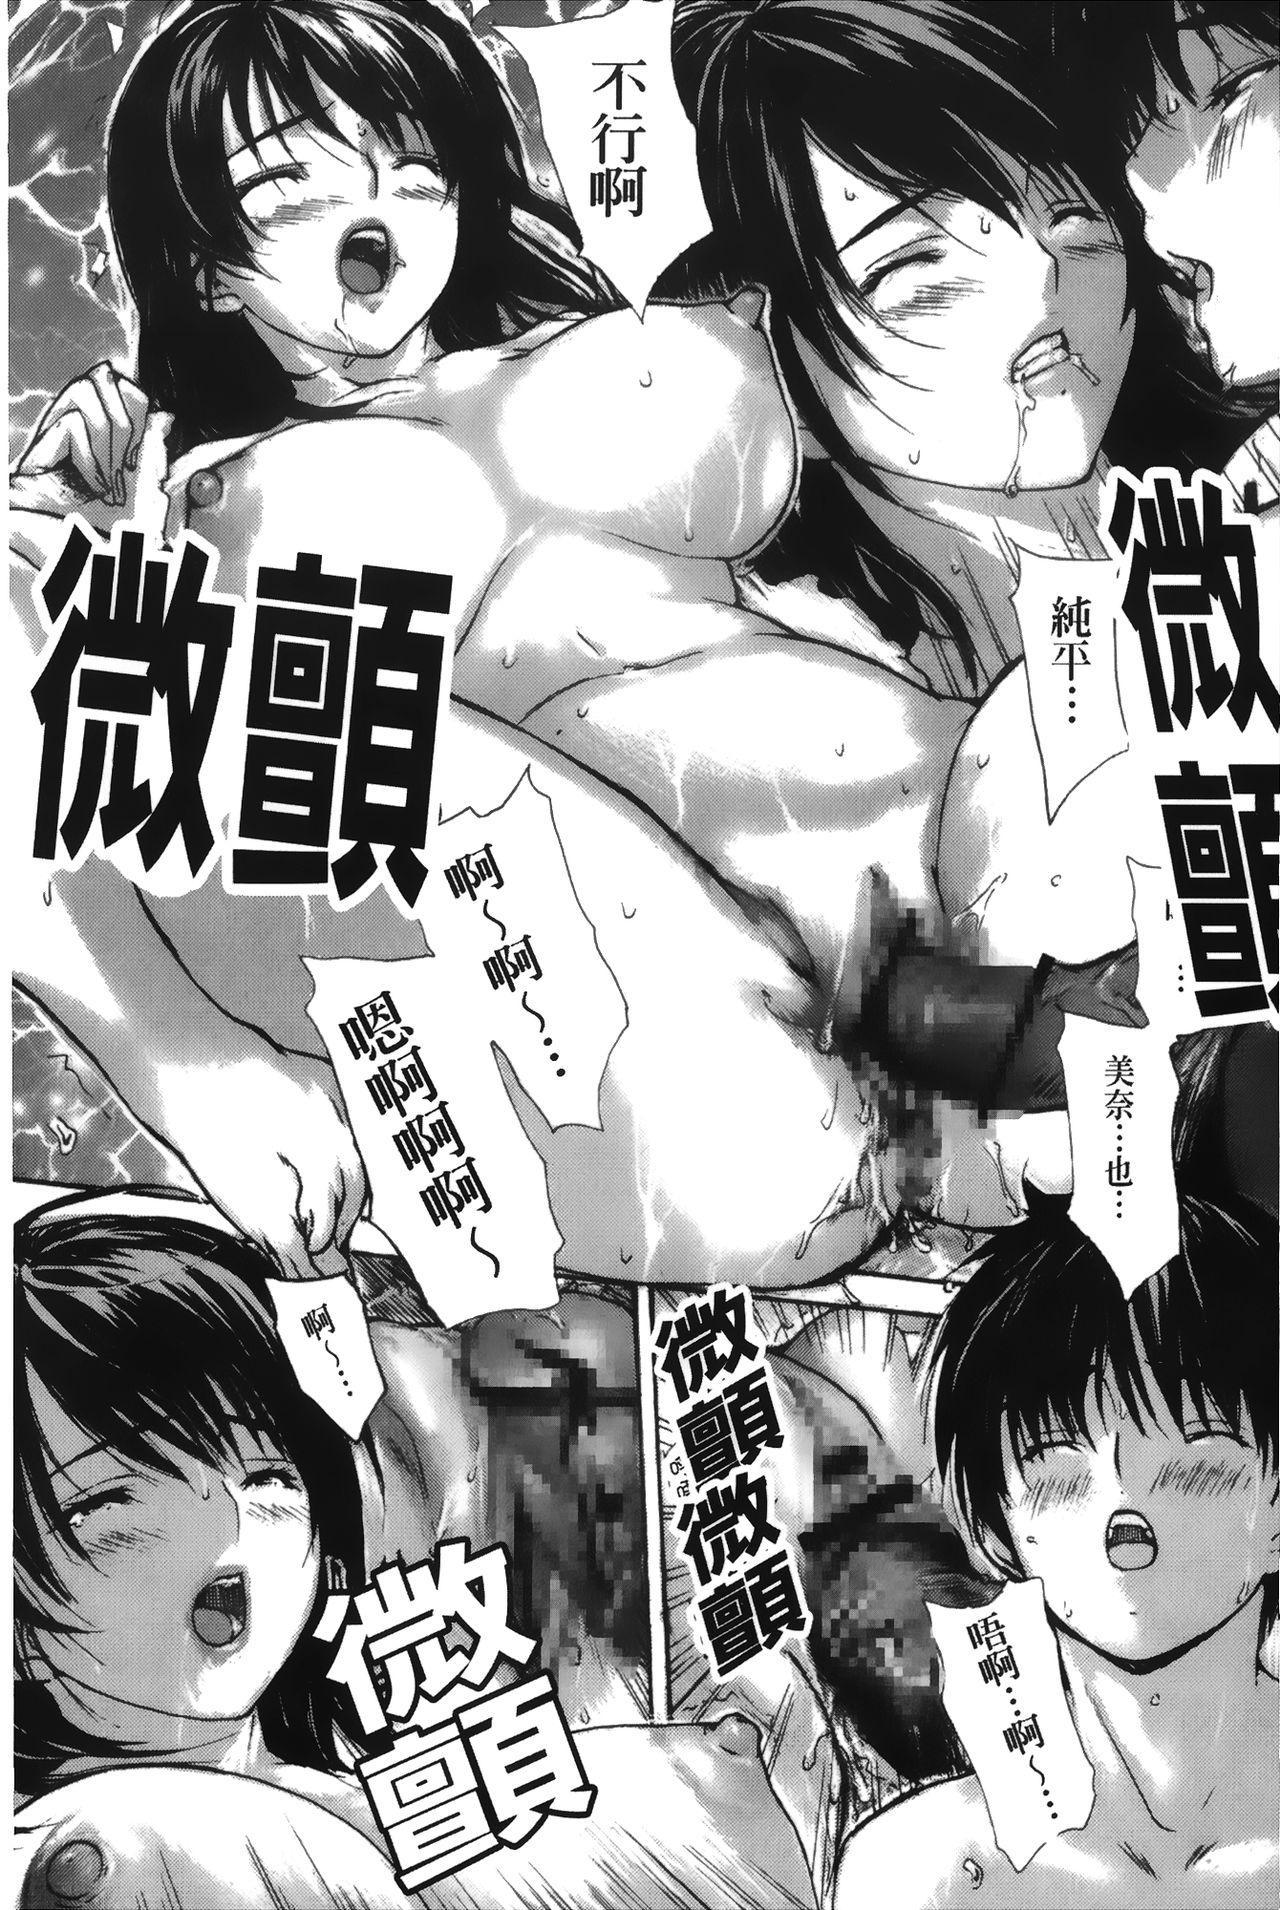 Tonari no Minano Sensei 4 | 隔壁的美奈乃老師 4 199